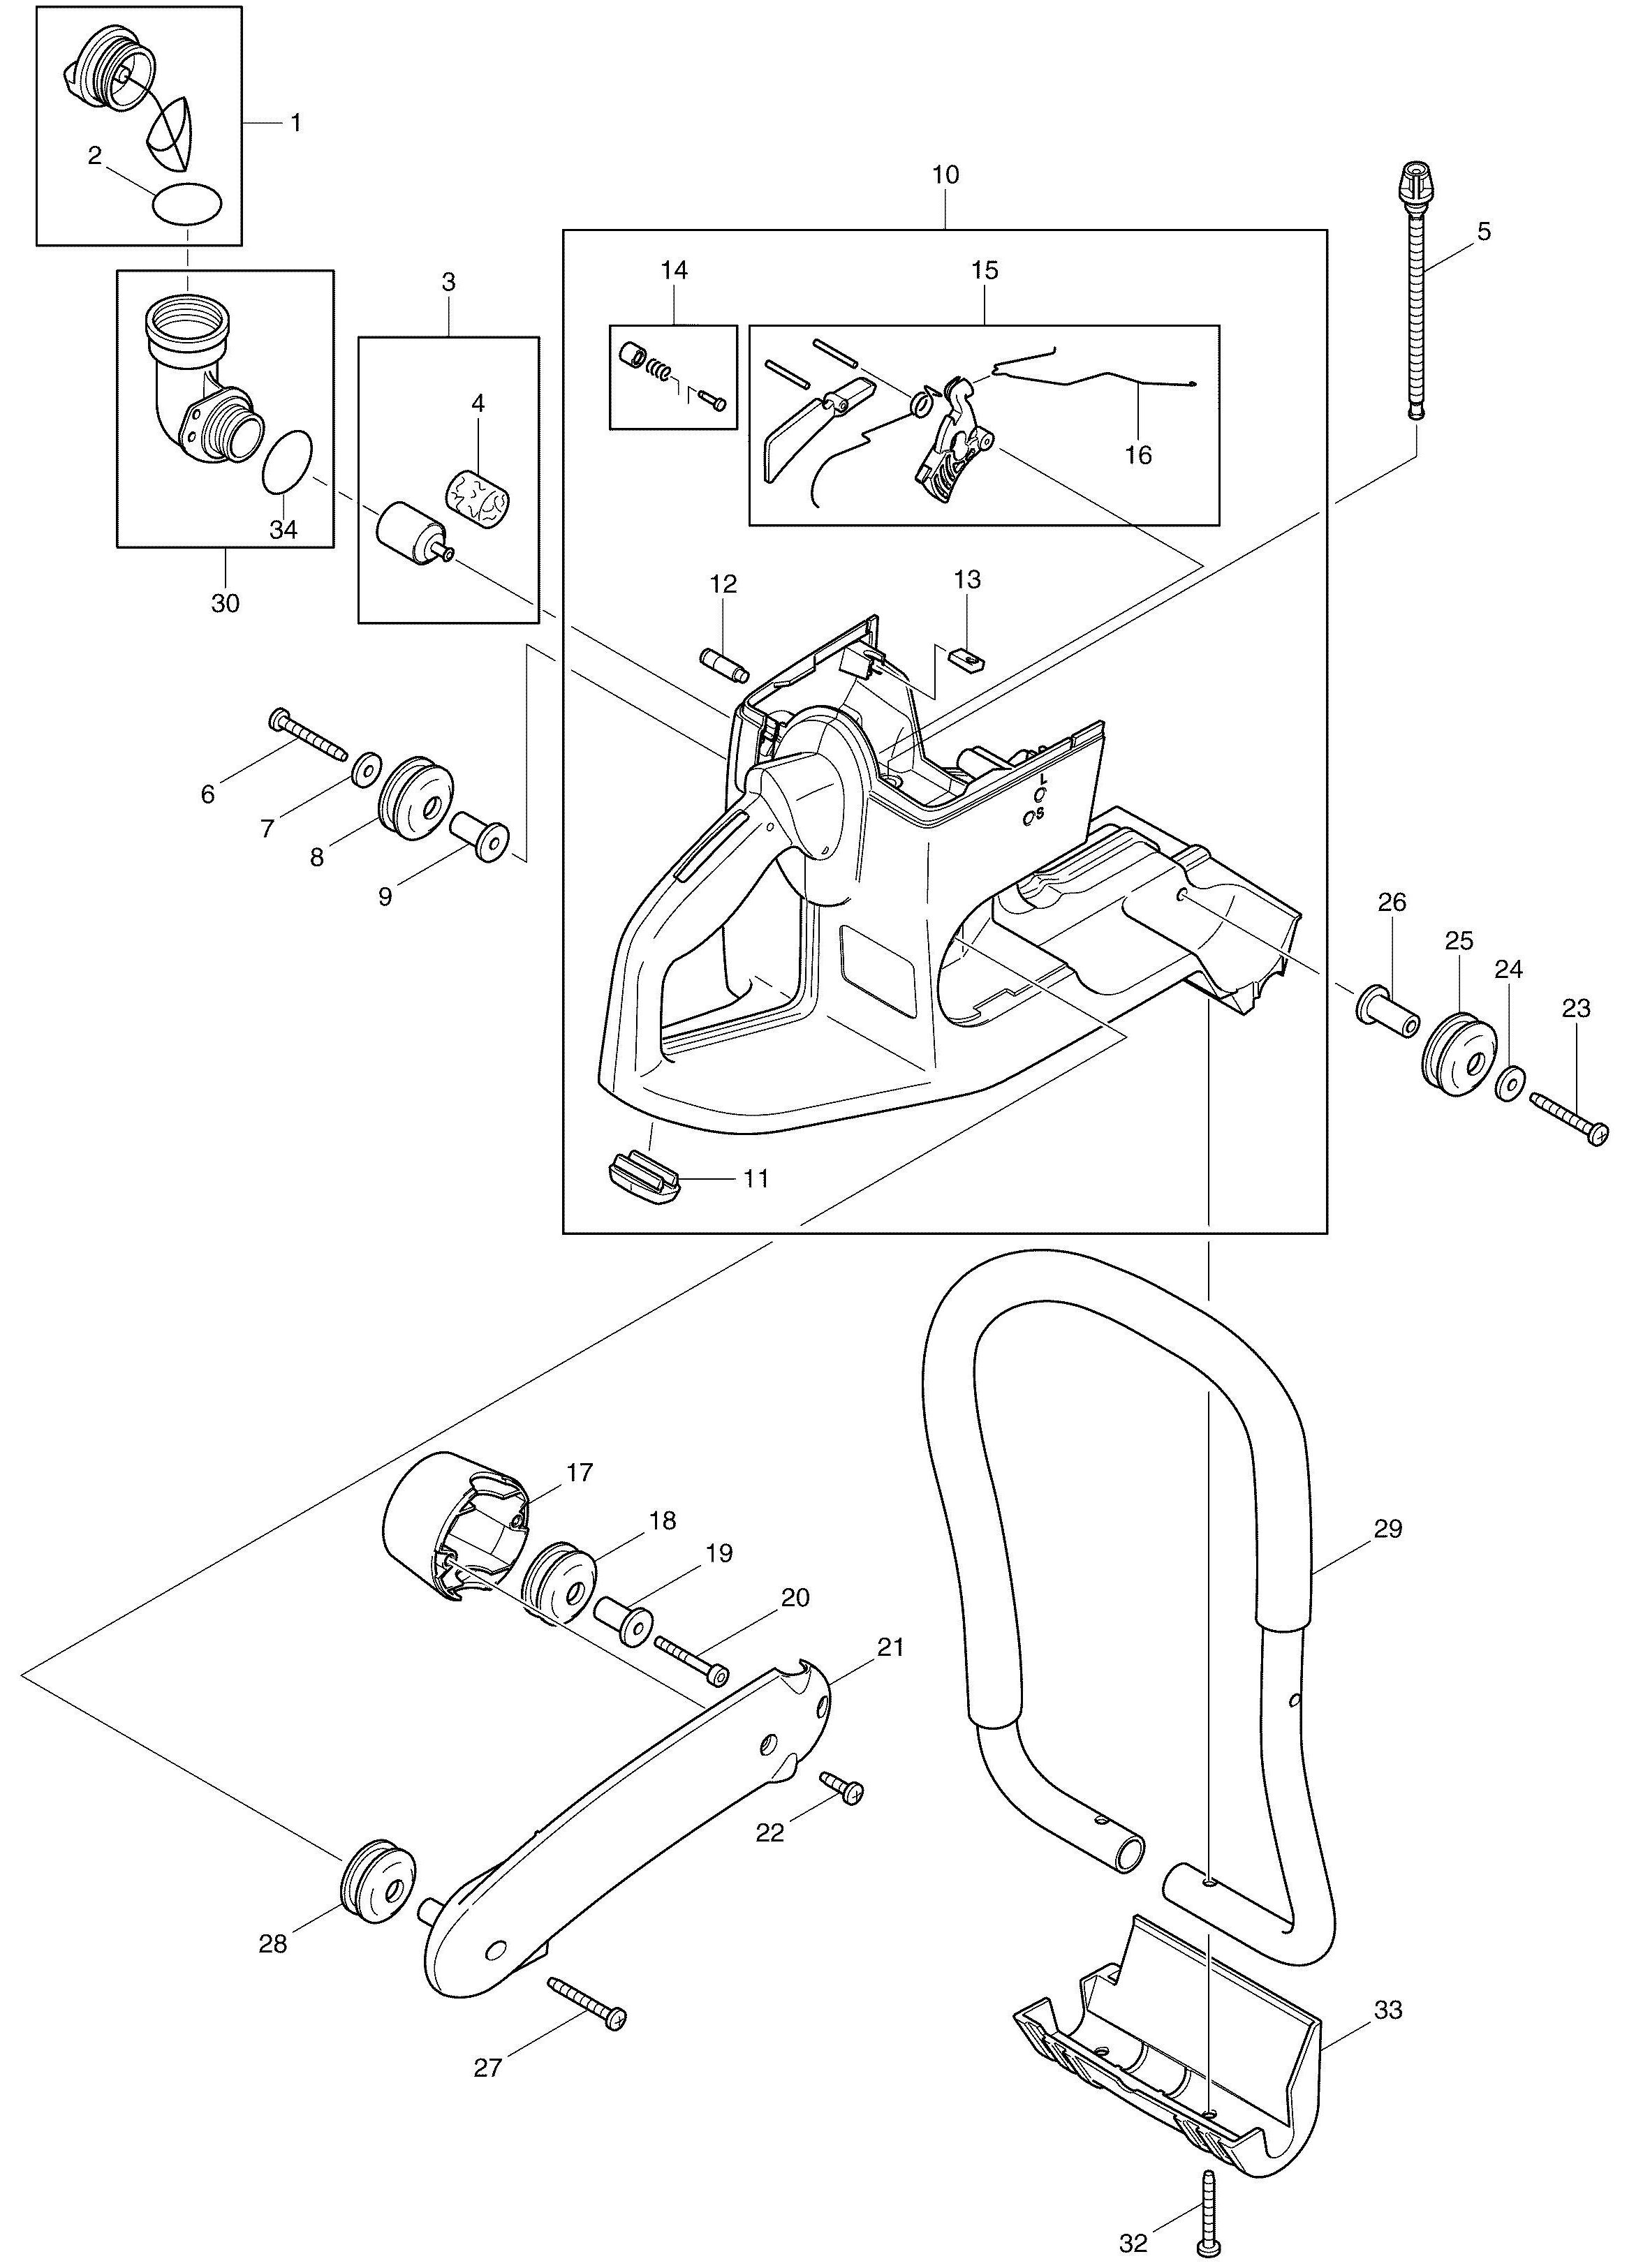 spares for makita dpc6400 petrol disc cutter spare dpc6400